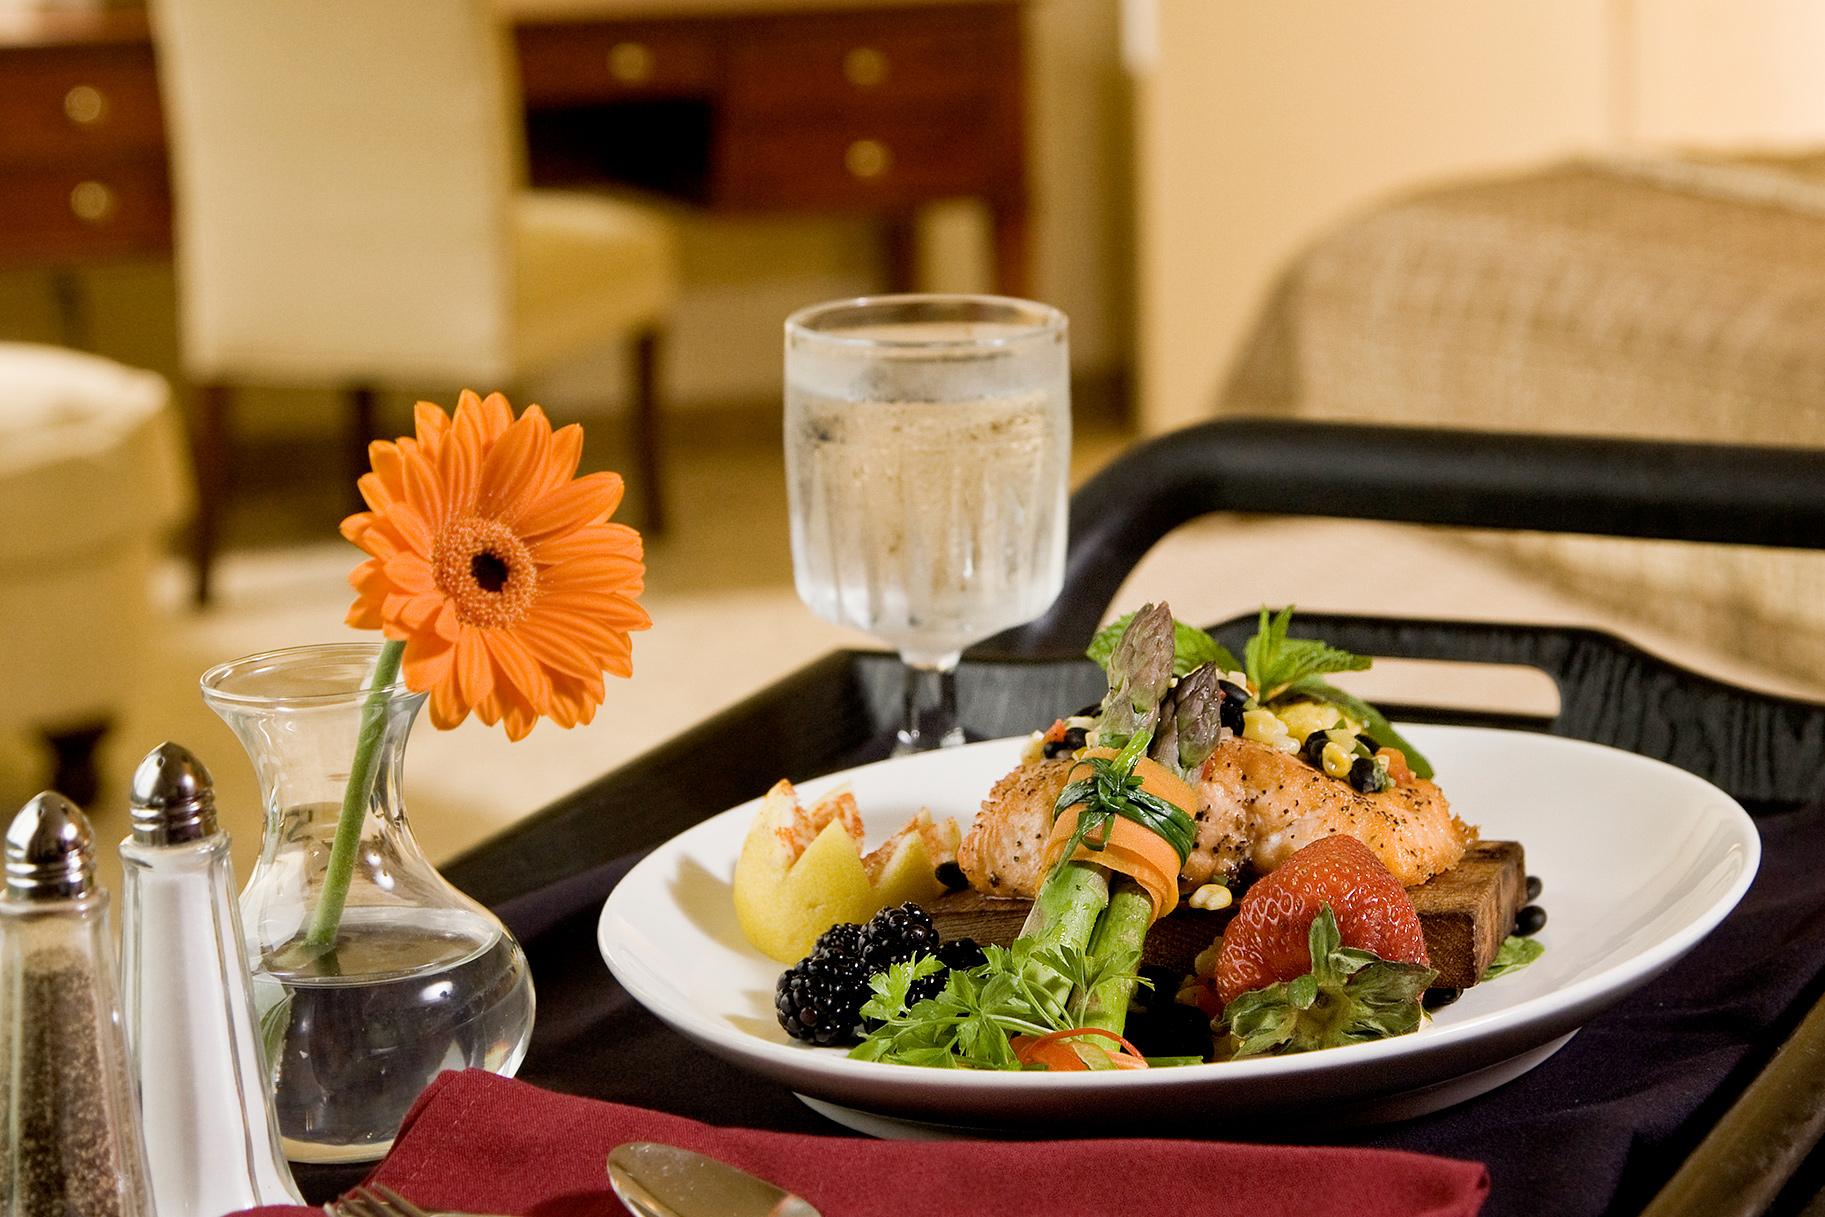 Room Service: Hyatt And GrubHub Partnership Means Better Room Service